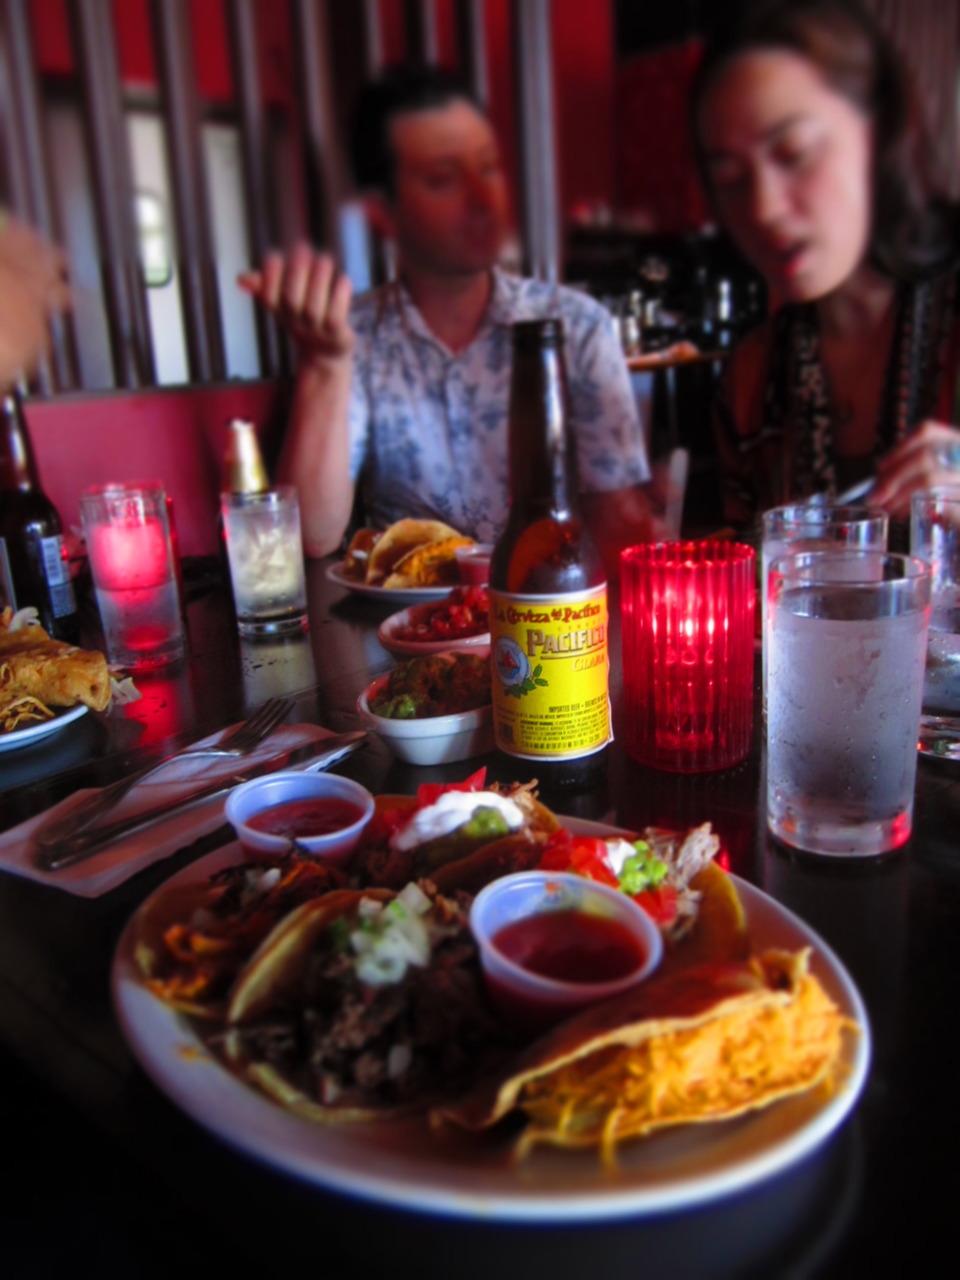 Lay-over tacos.  Malo 's. Los Angeles, CA